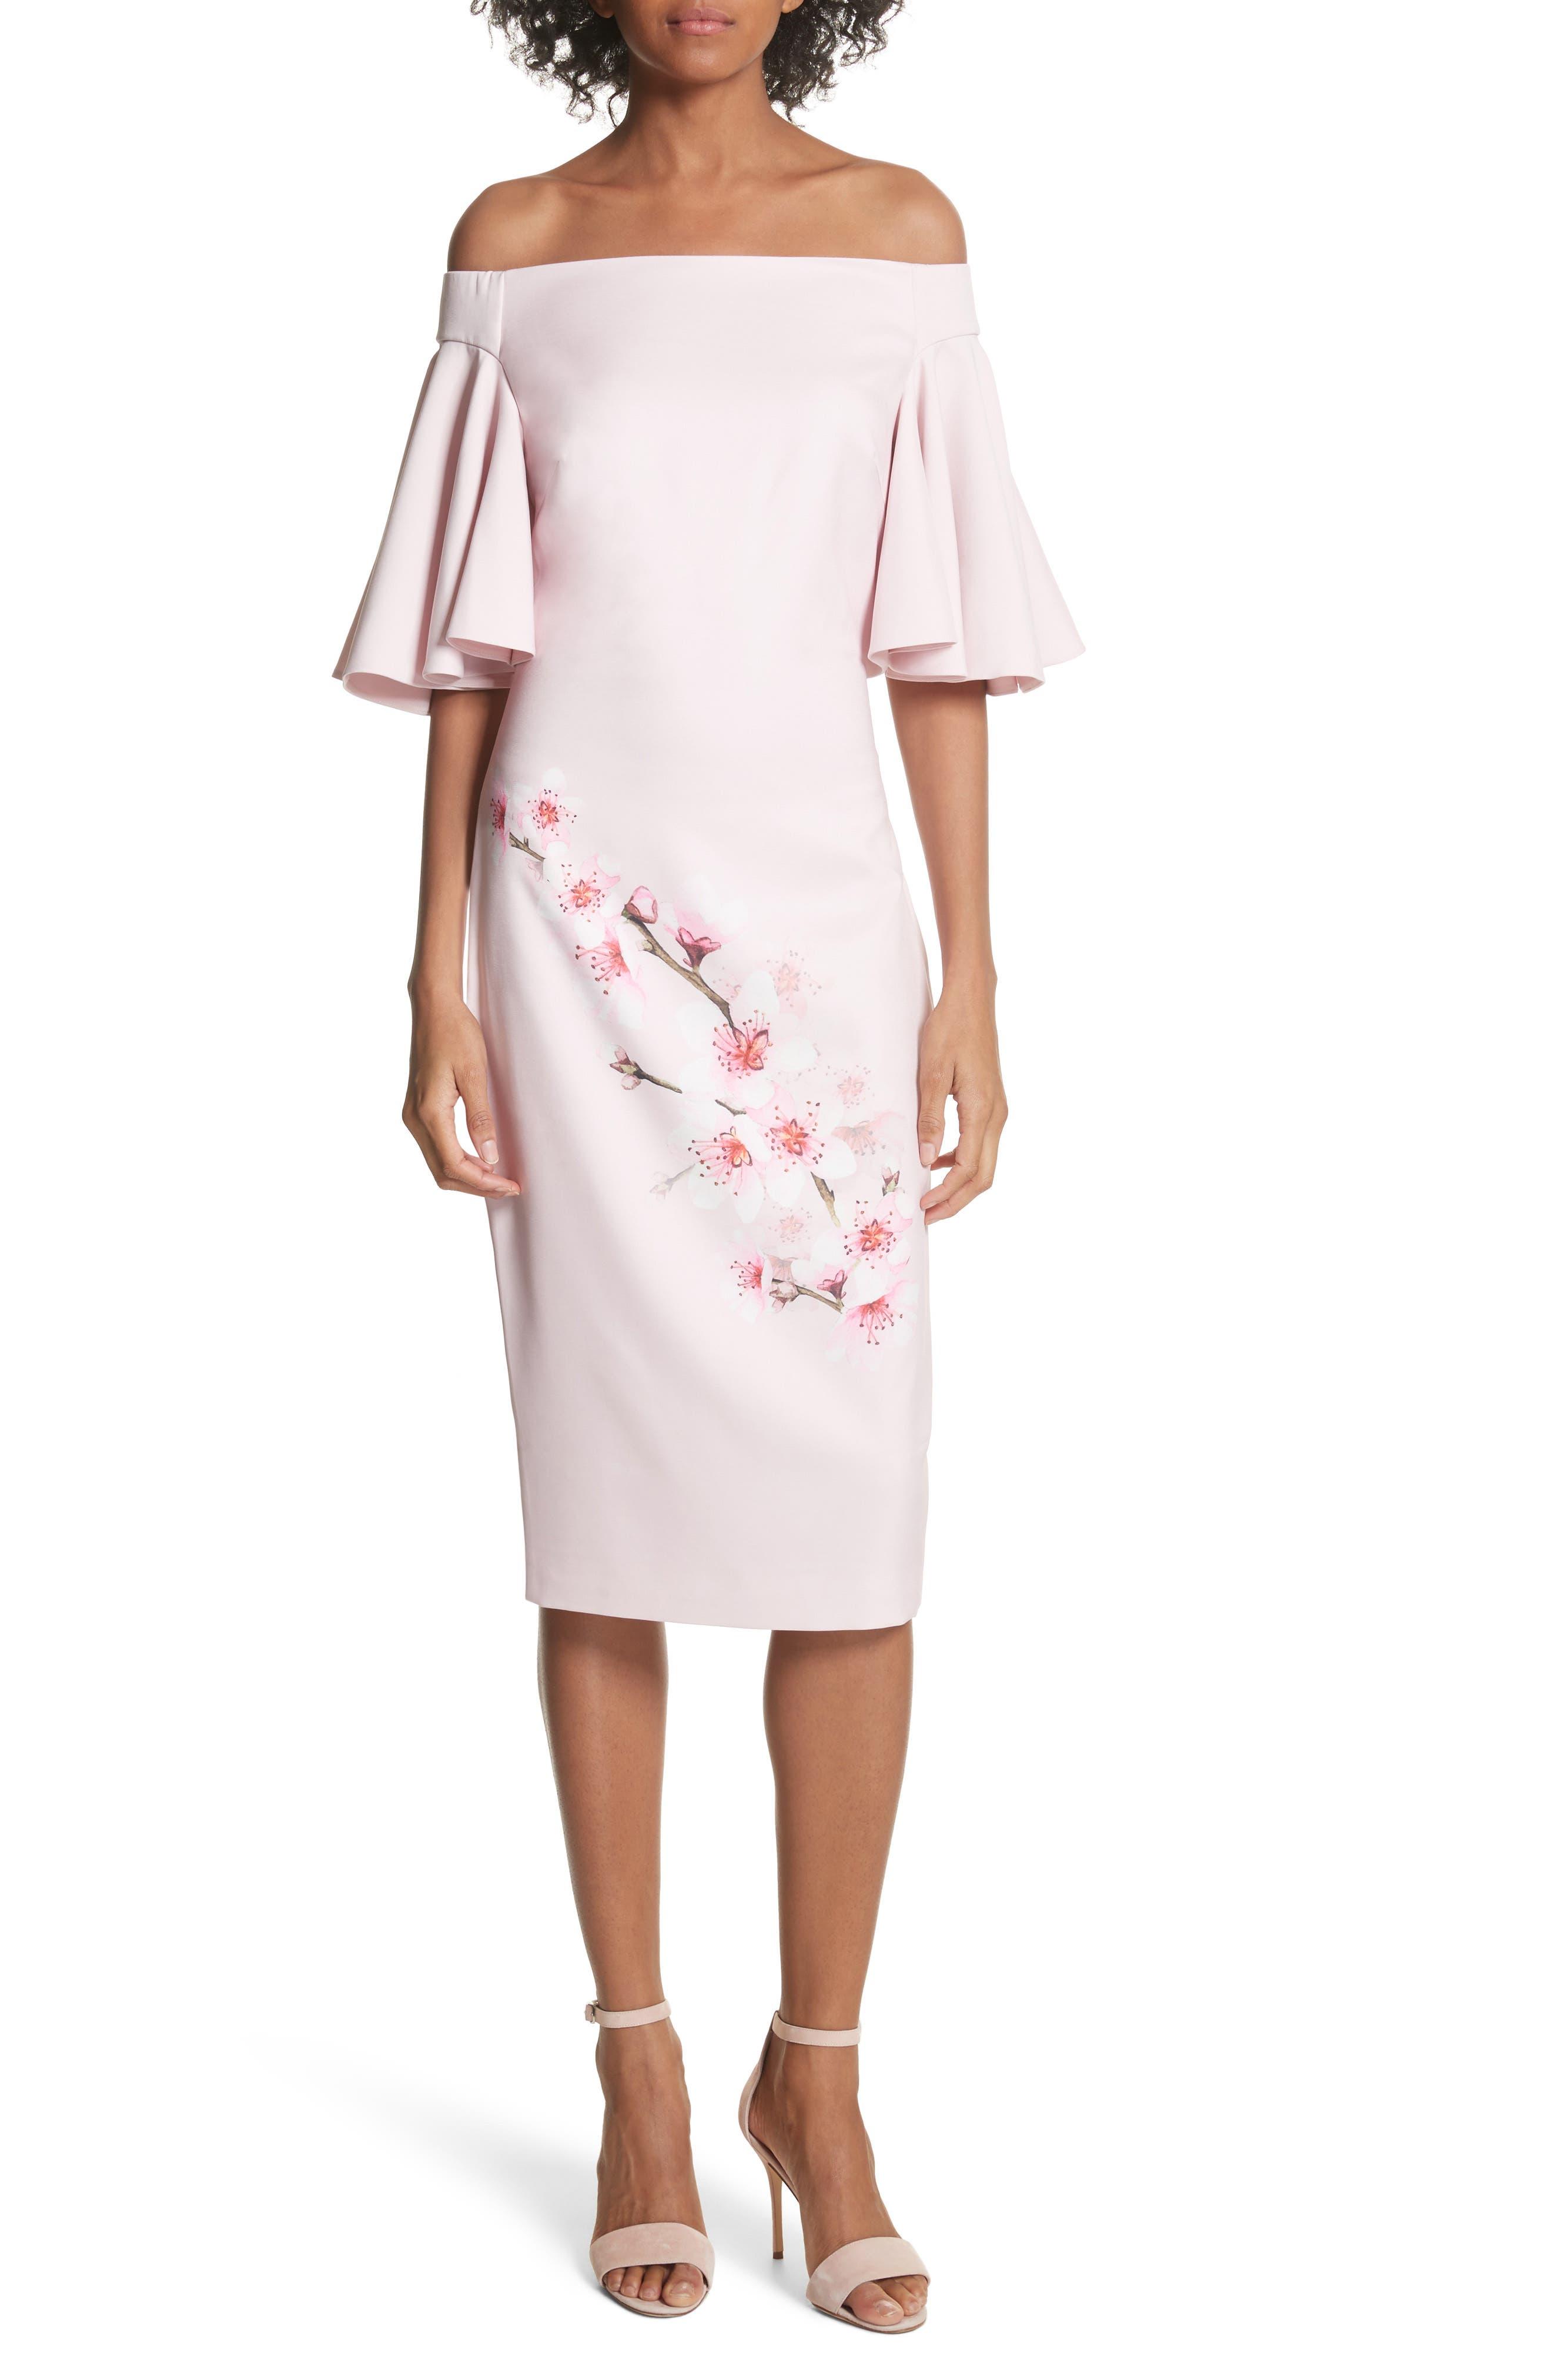 Soft Blossom Off the Shoulder Sheath Dress,                         Main,                         color, Light Pink